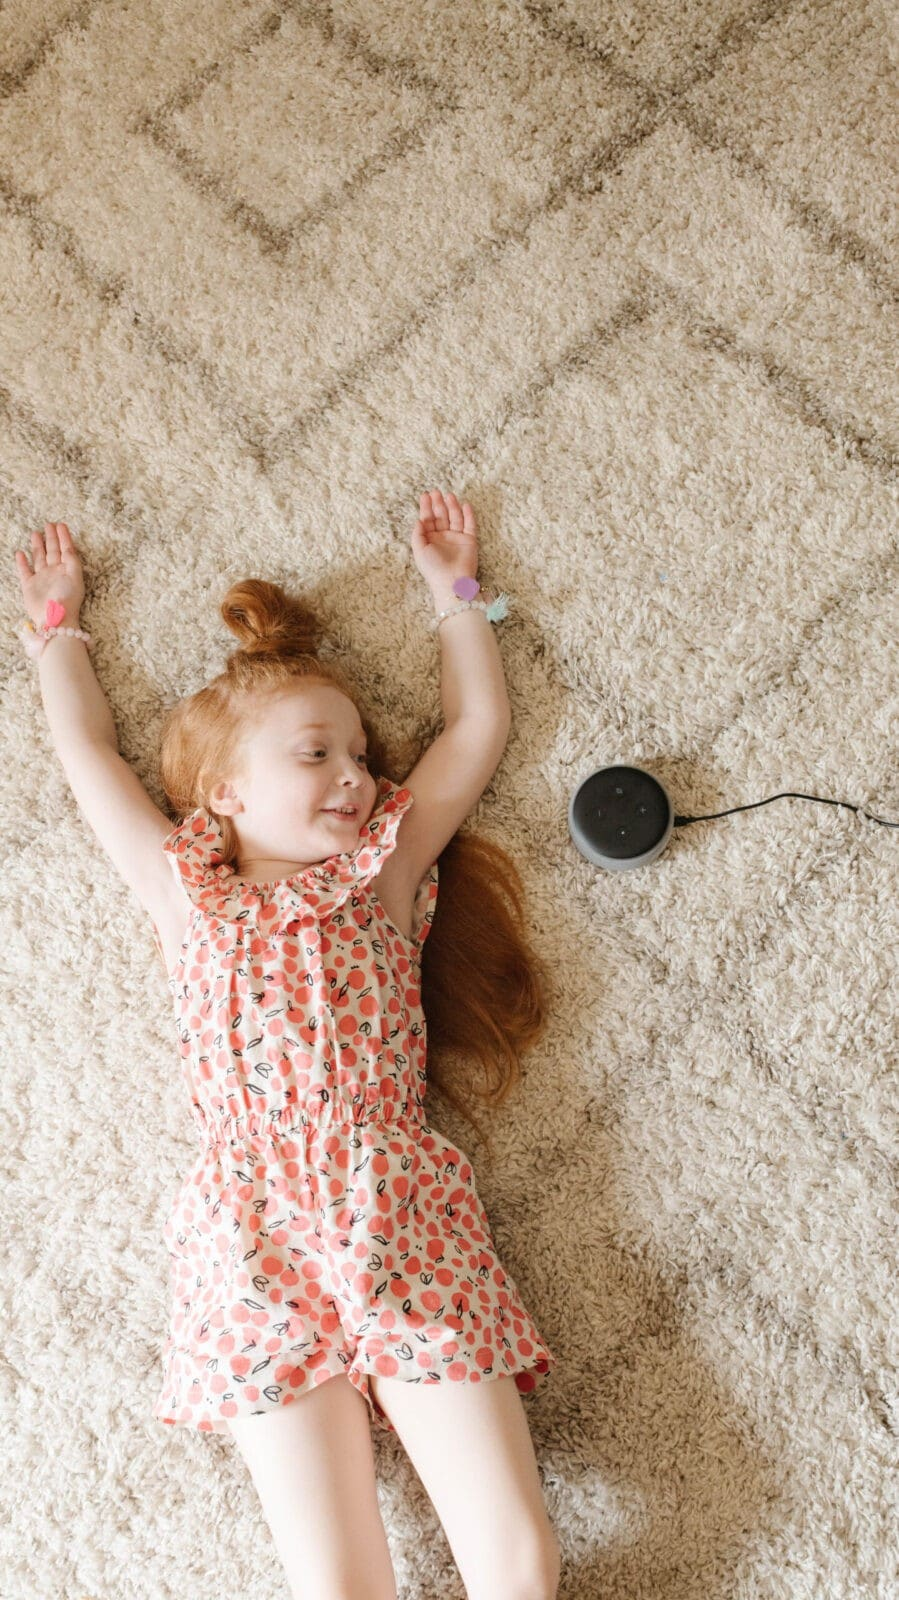 Disney Music Amazon Echo download the Disney Hits Playlist